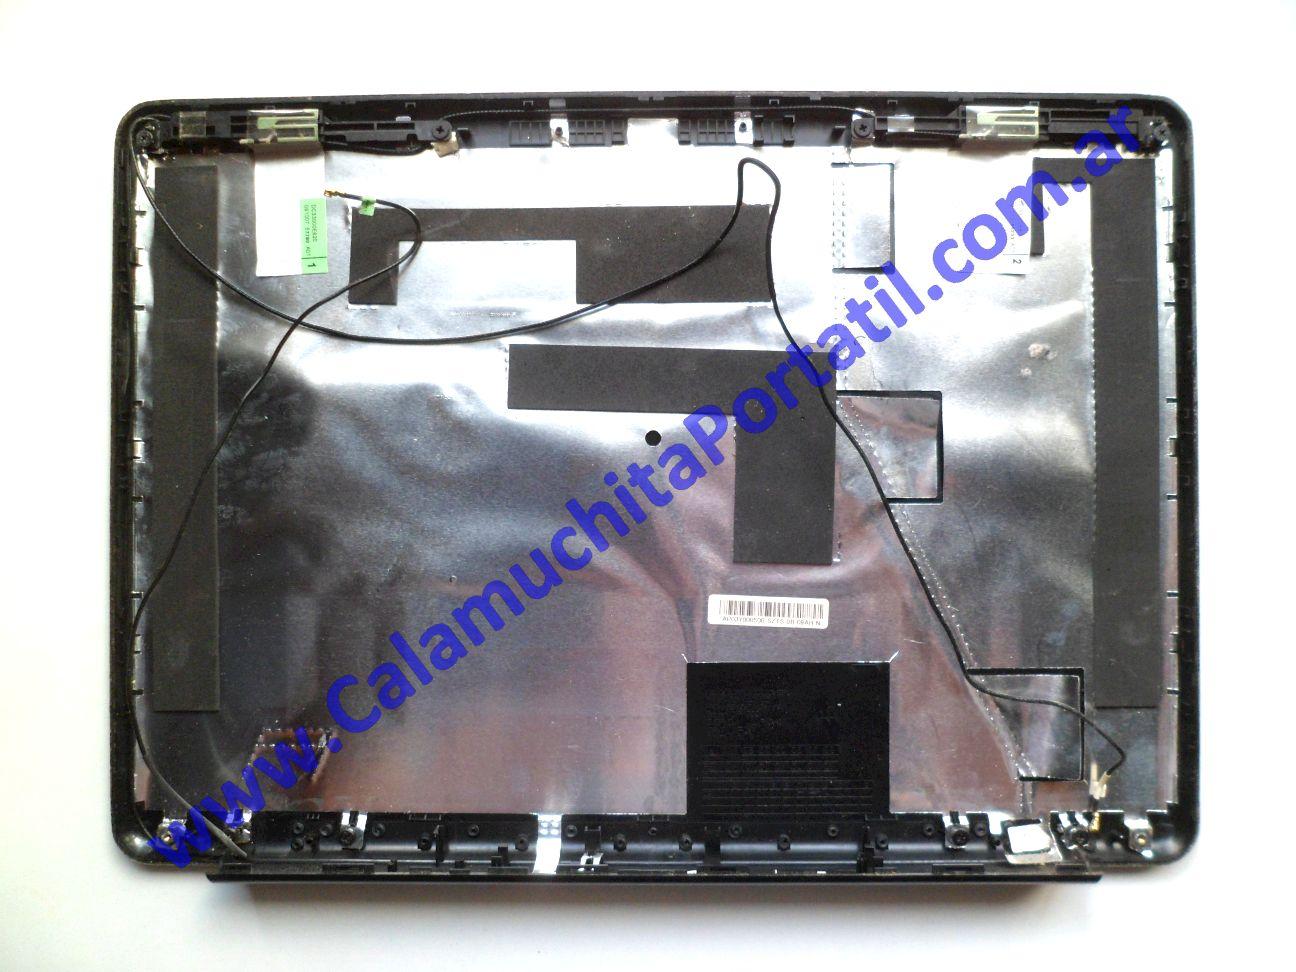 0514CAA Carcasa Tapa Hewlett Packard Presario CQ40-600LA / VS569LA#AC8